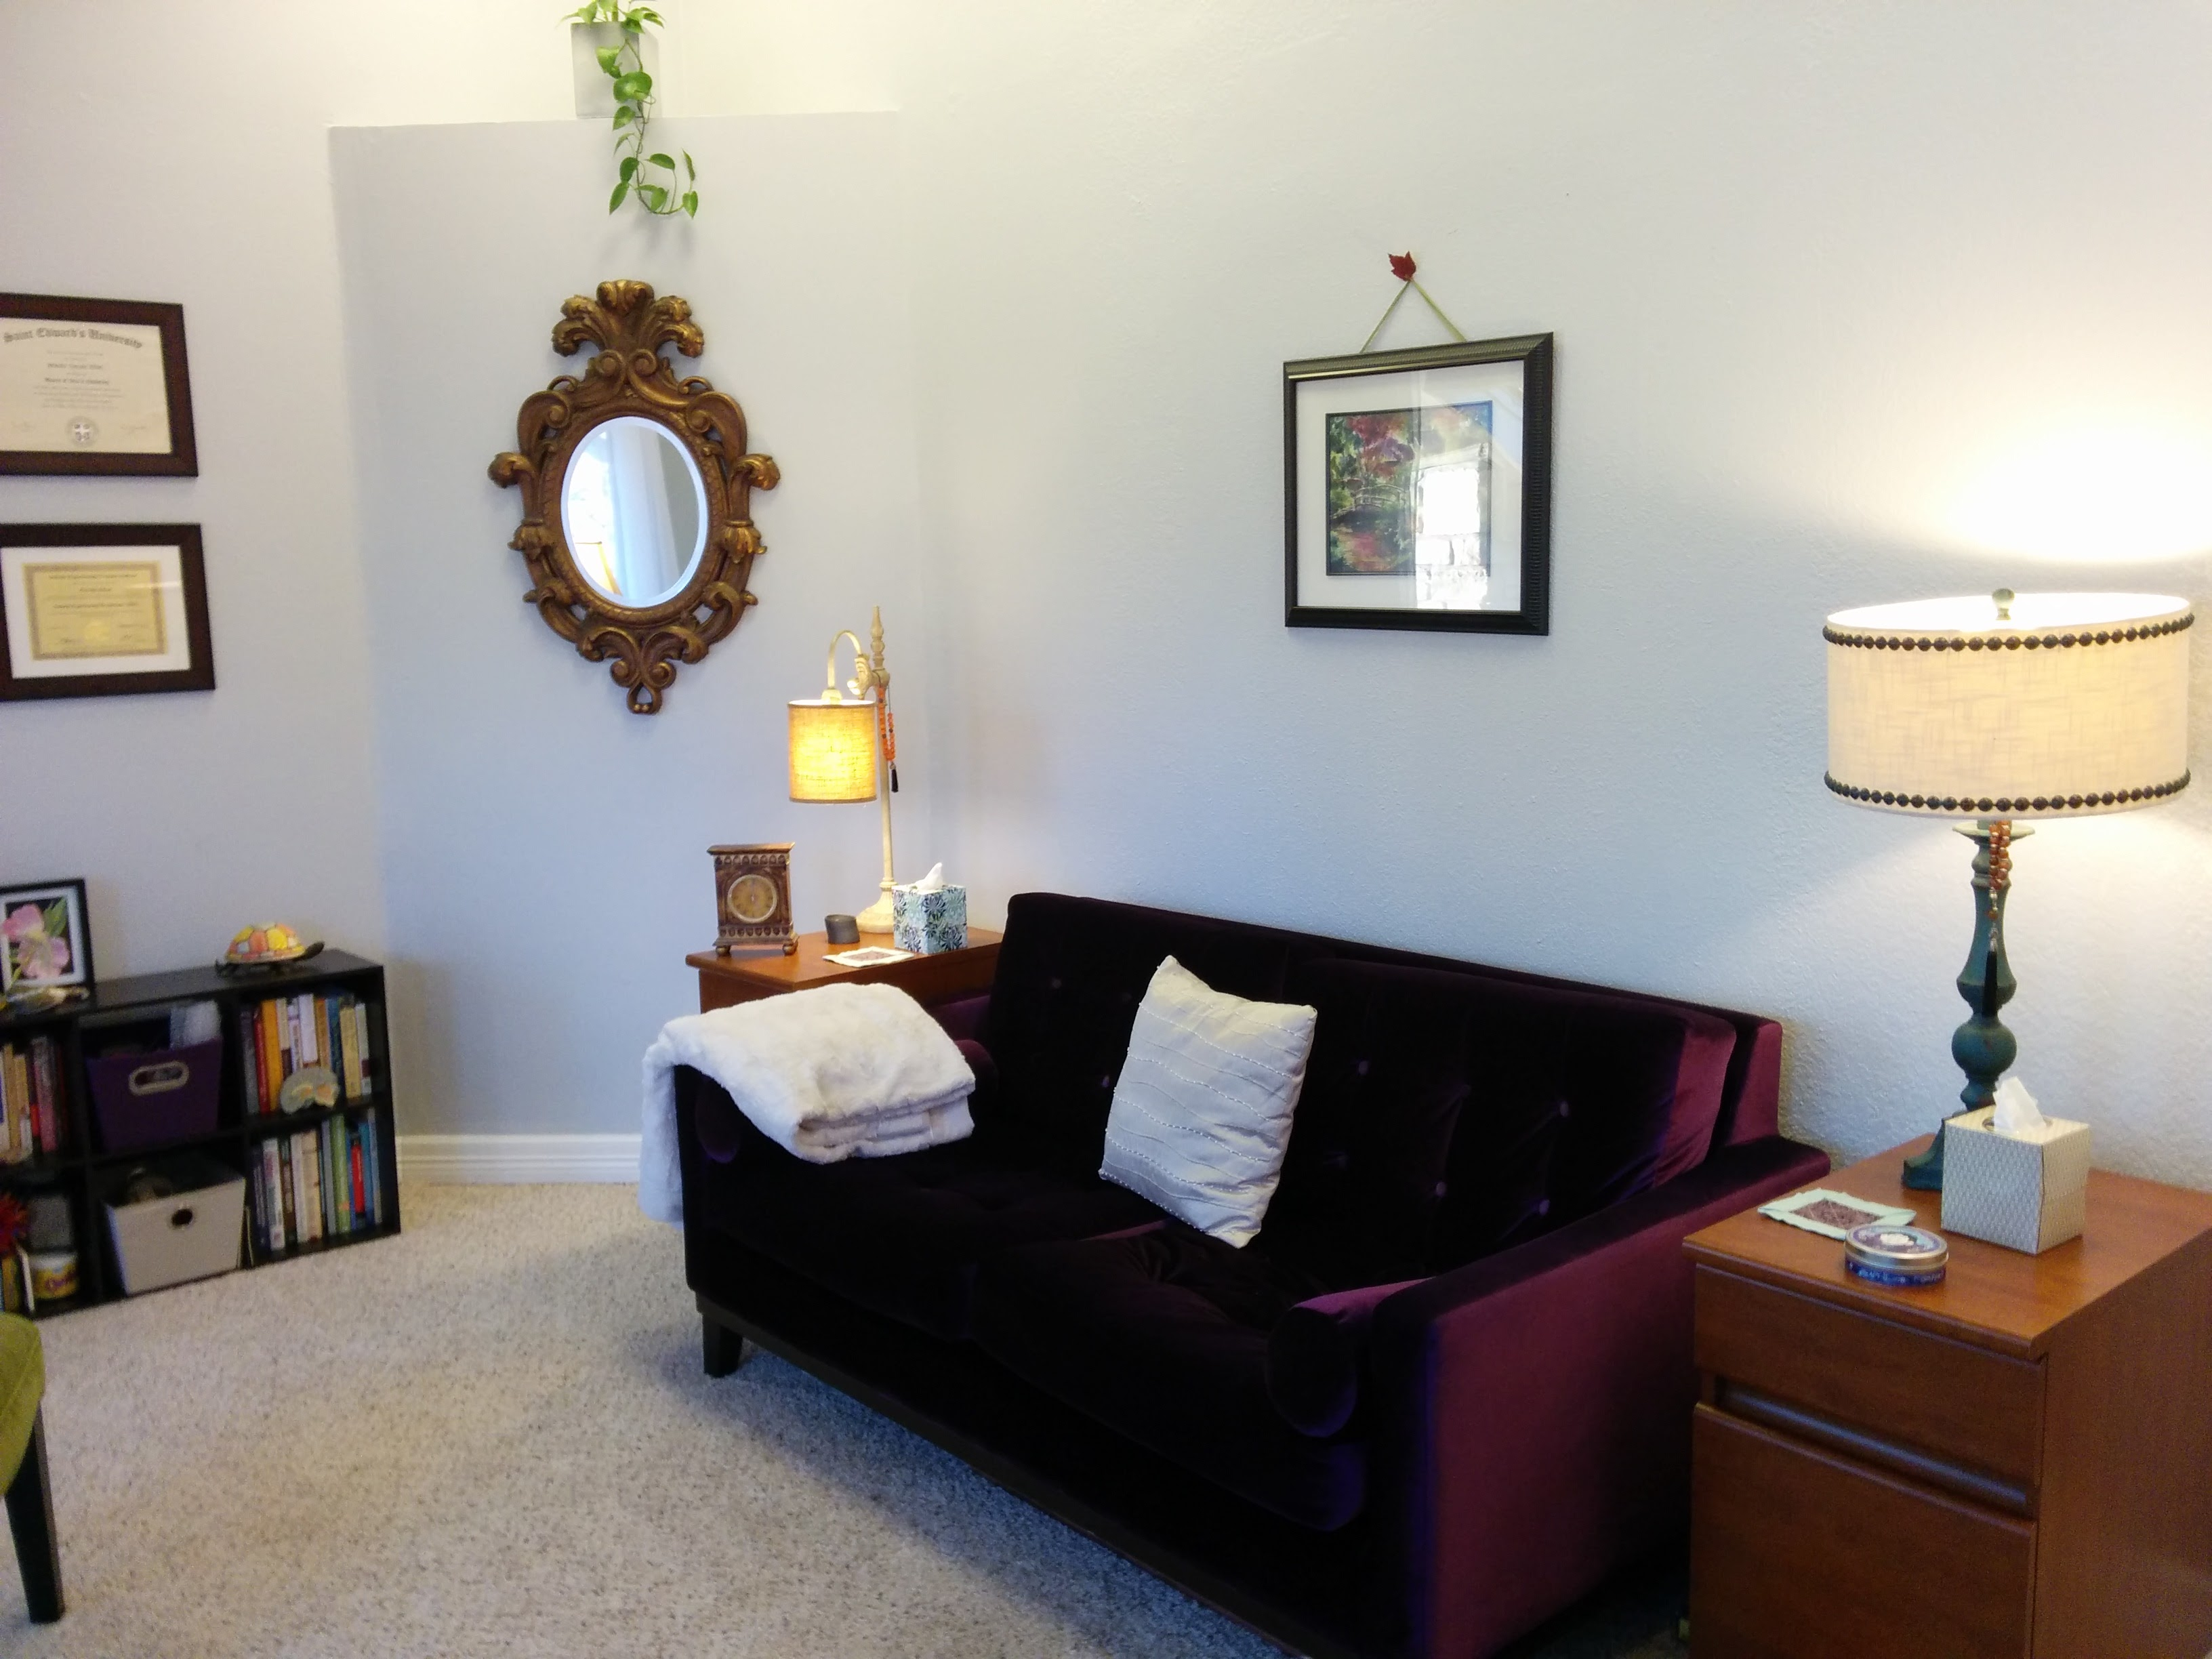 Counseling office of Priscilla Elliott